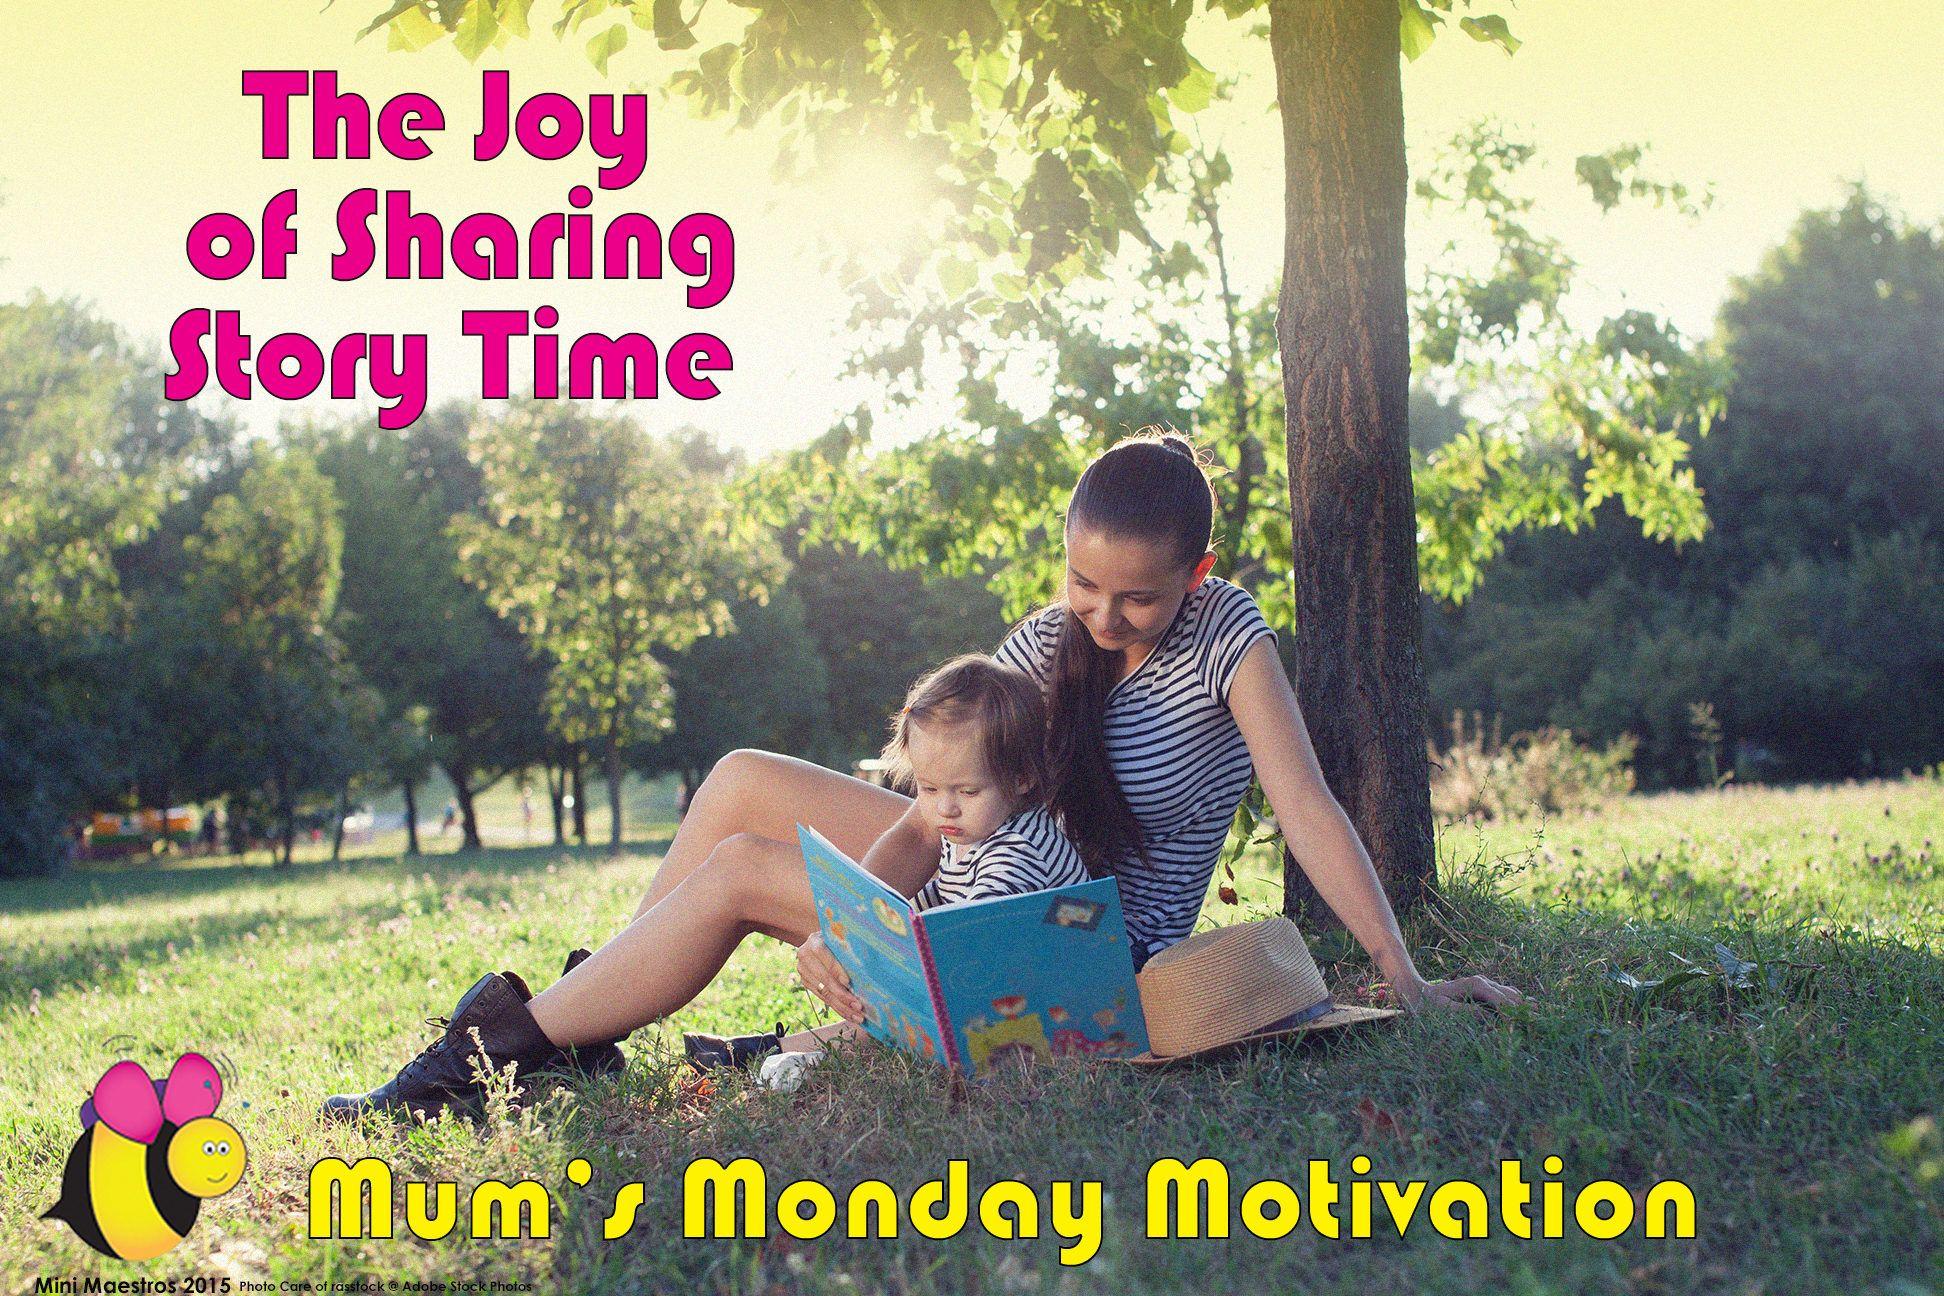 Mum's Monday Motivation - The Joy of Sharing Story Time